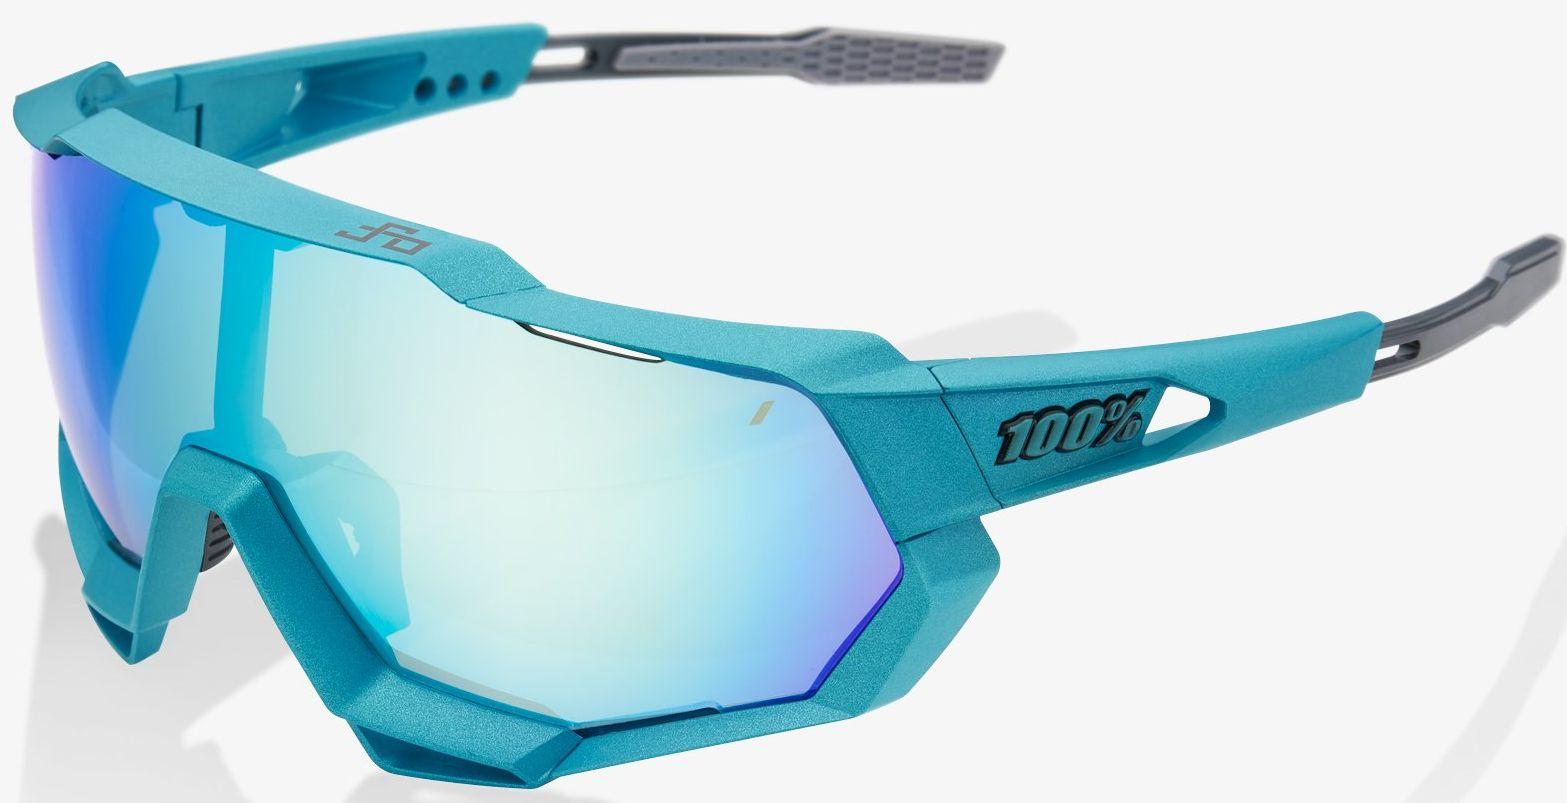 100% Speedtrap - Peter Sagan LE Blue Topaz / Mirror Lens uni